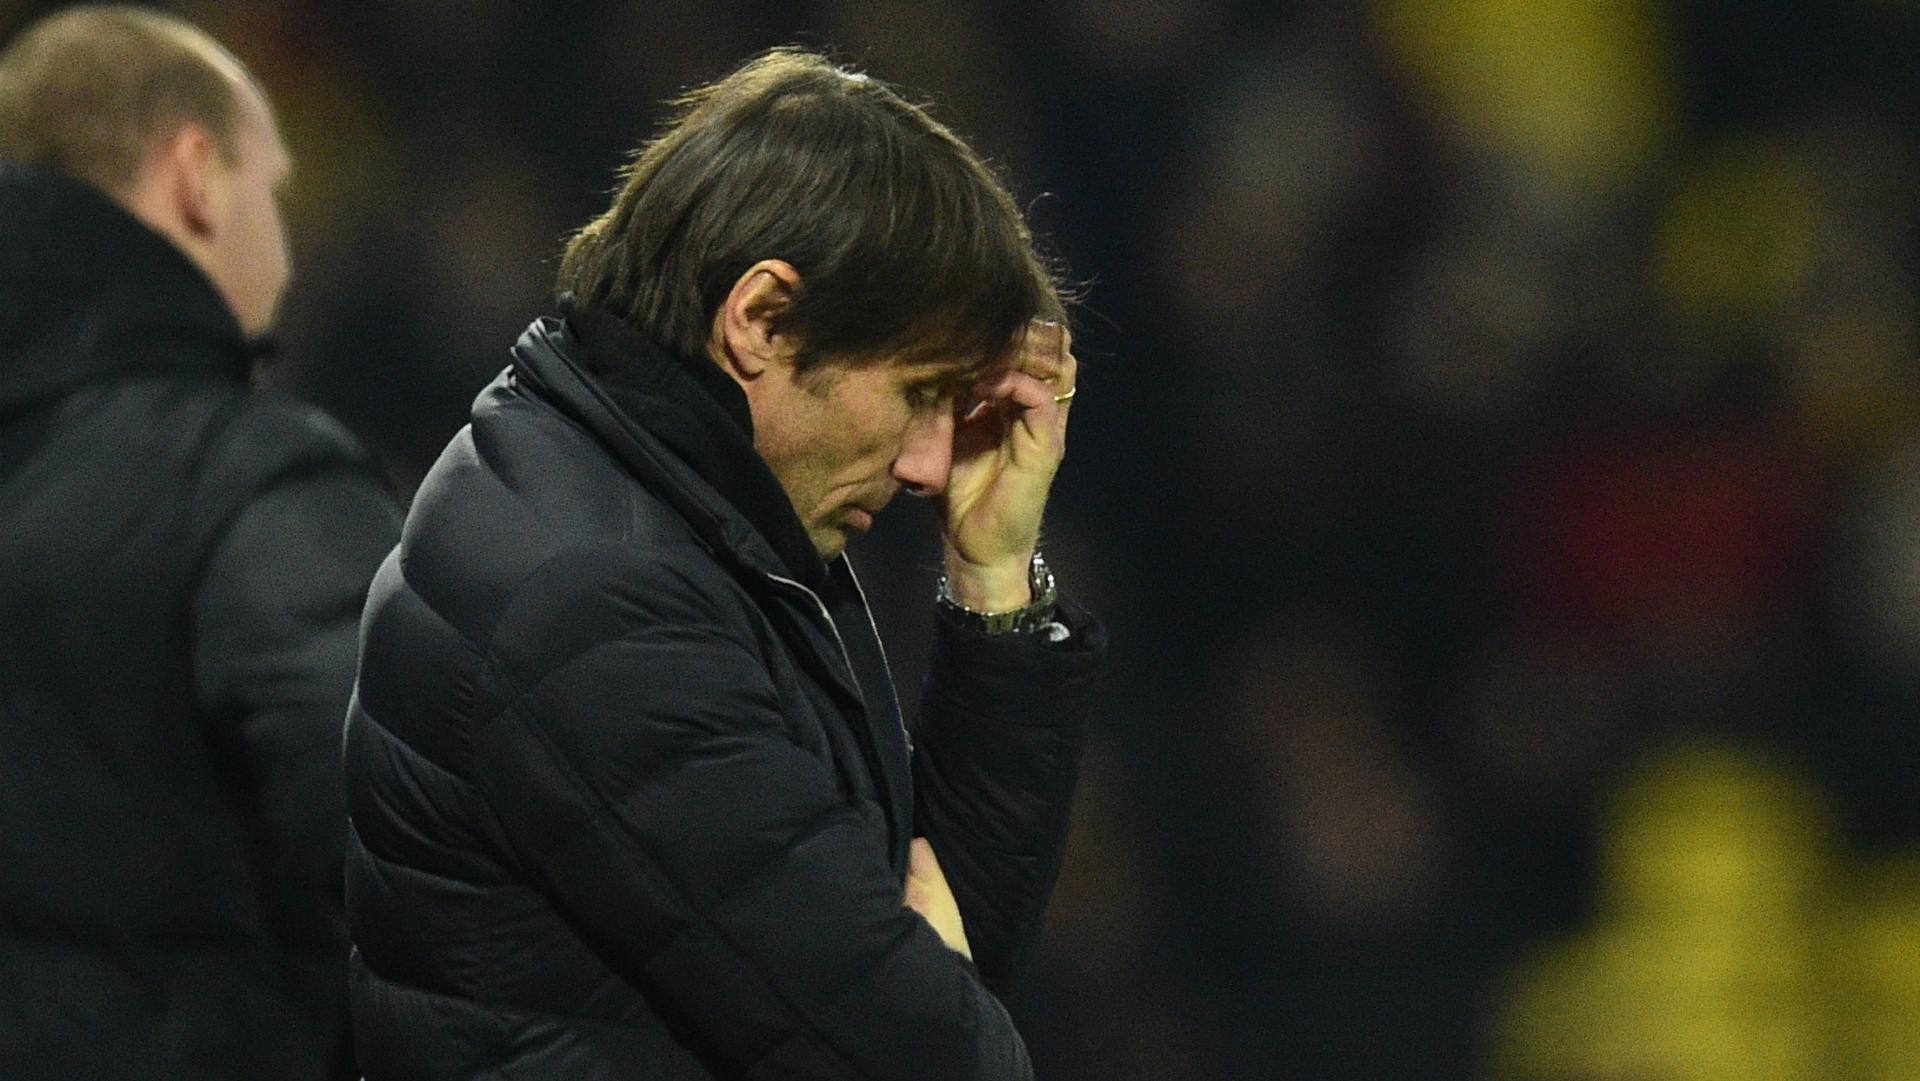 Luis Enrique pode ser o novo treinador do Chelsea, diz jornal